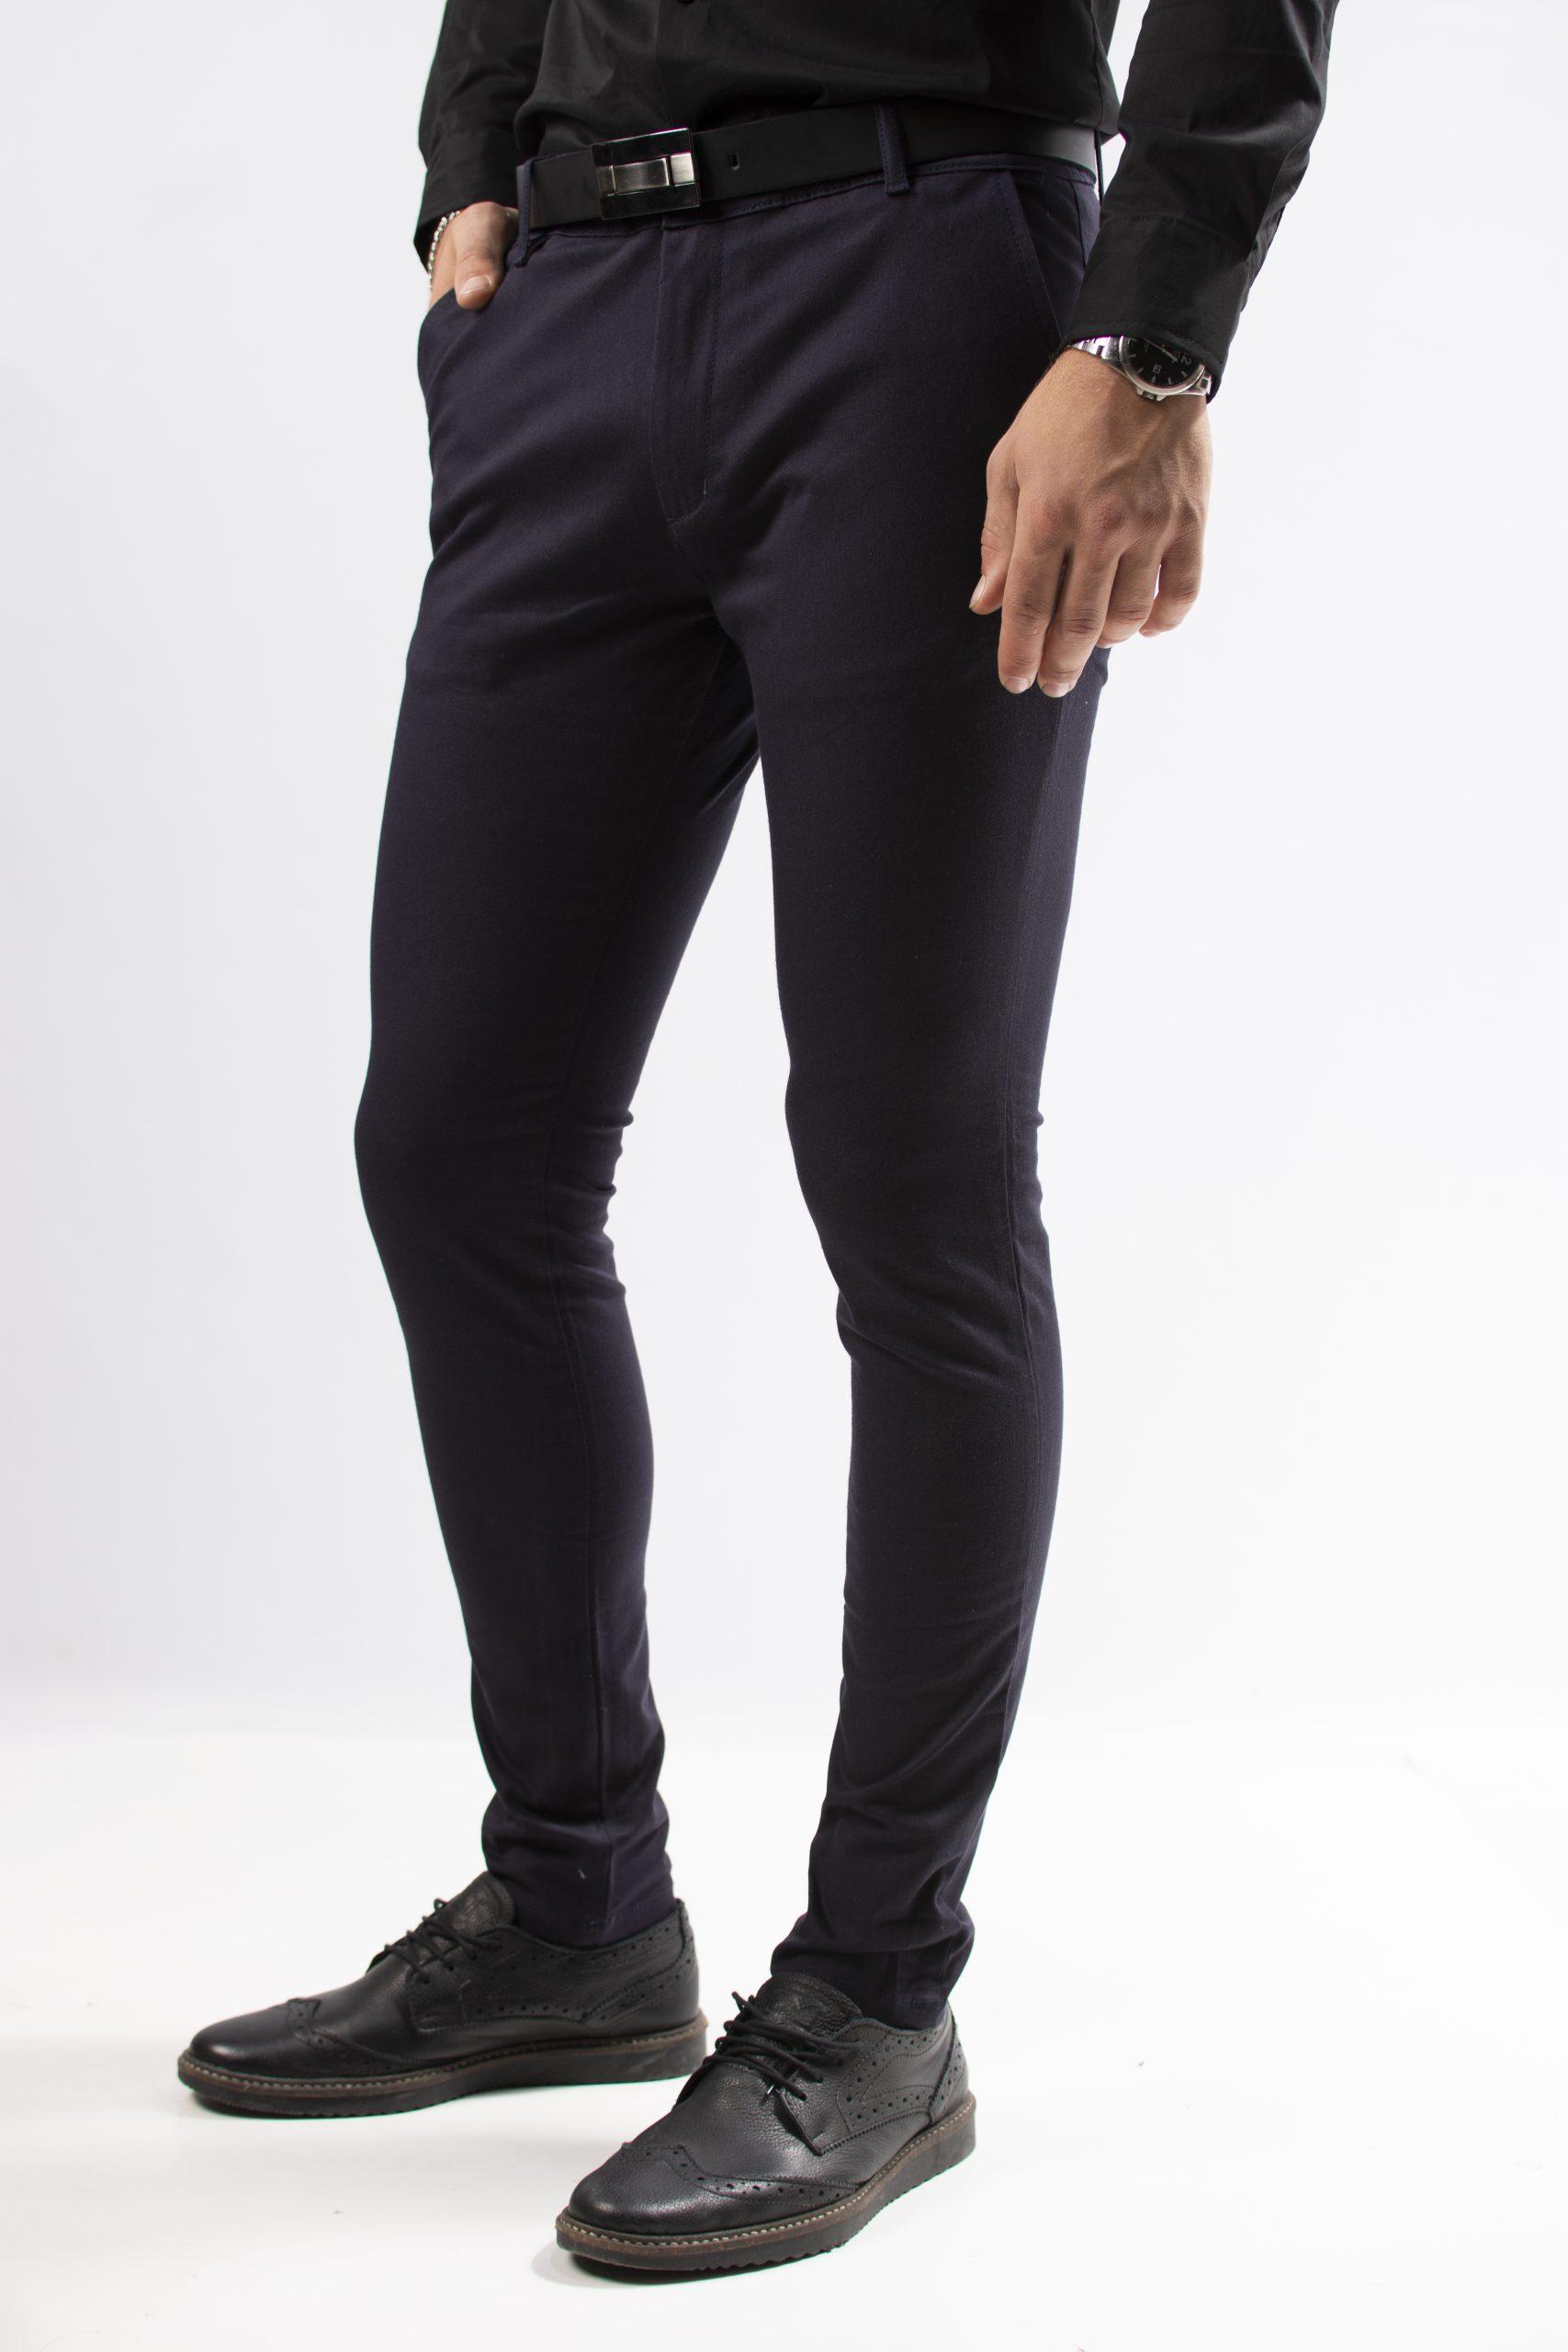 Pantalon Corte Chino Jc Moda Tienda Online